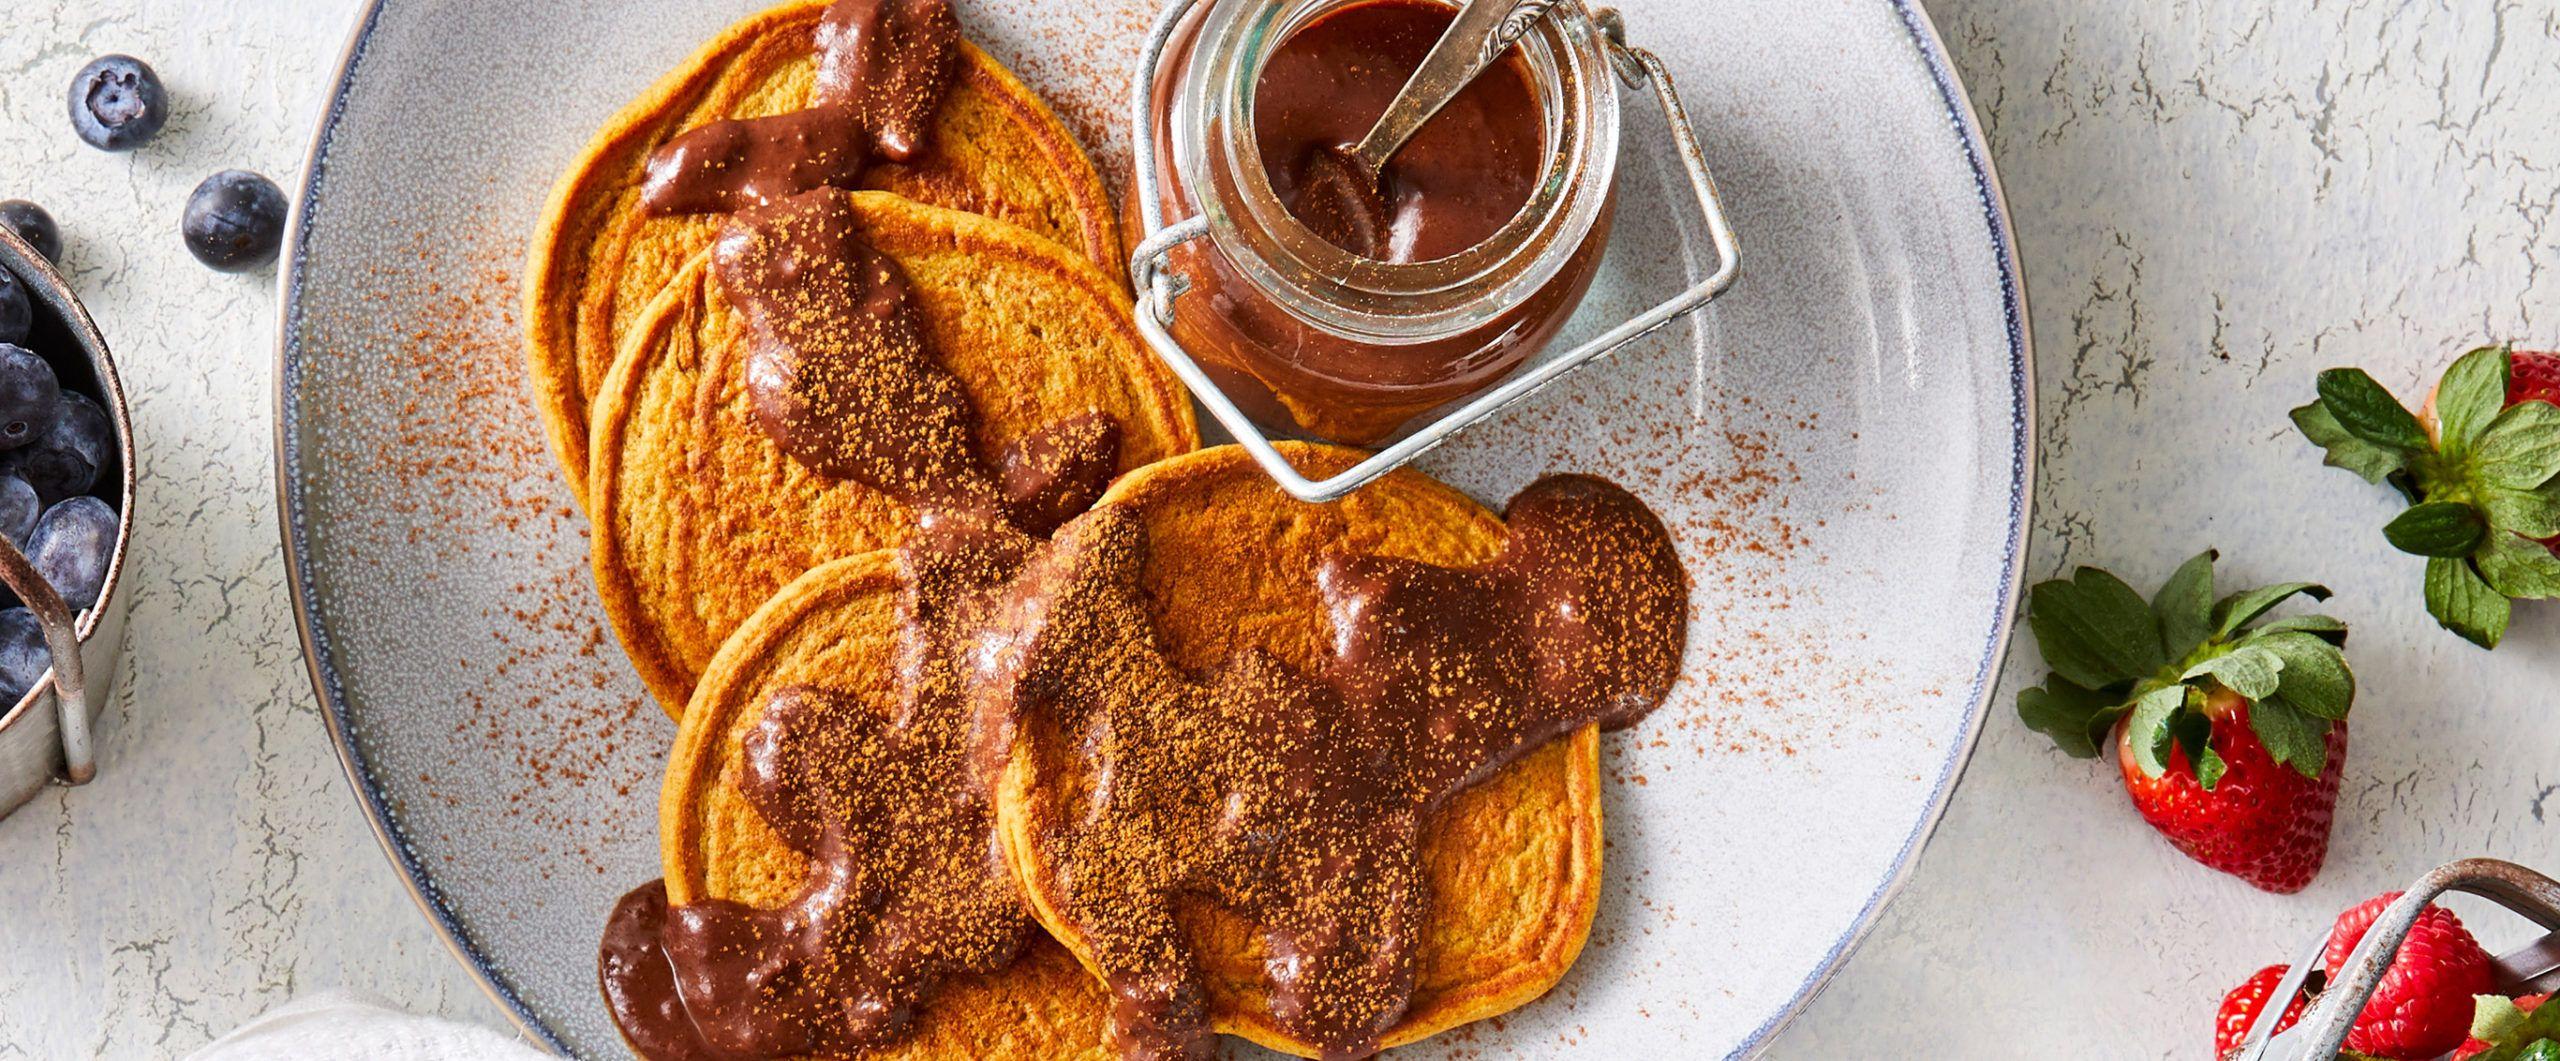 Sweet Potato Flapjacks With Warm Chocolate Sauce Forks Over Knives Vegan Breakfast Recipes Food Processor Recipes Raw Food Recipes